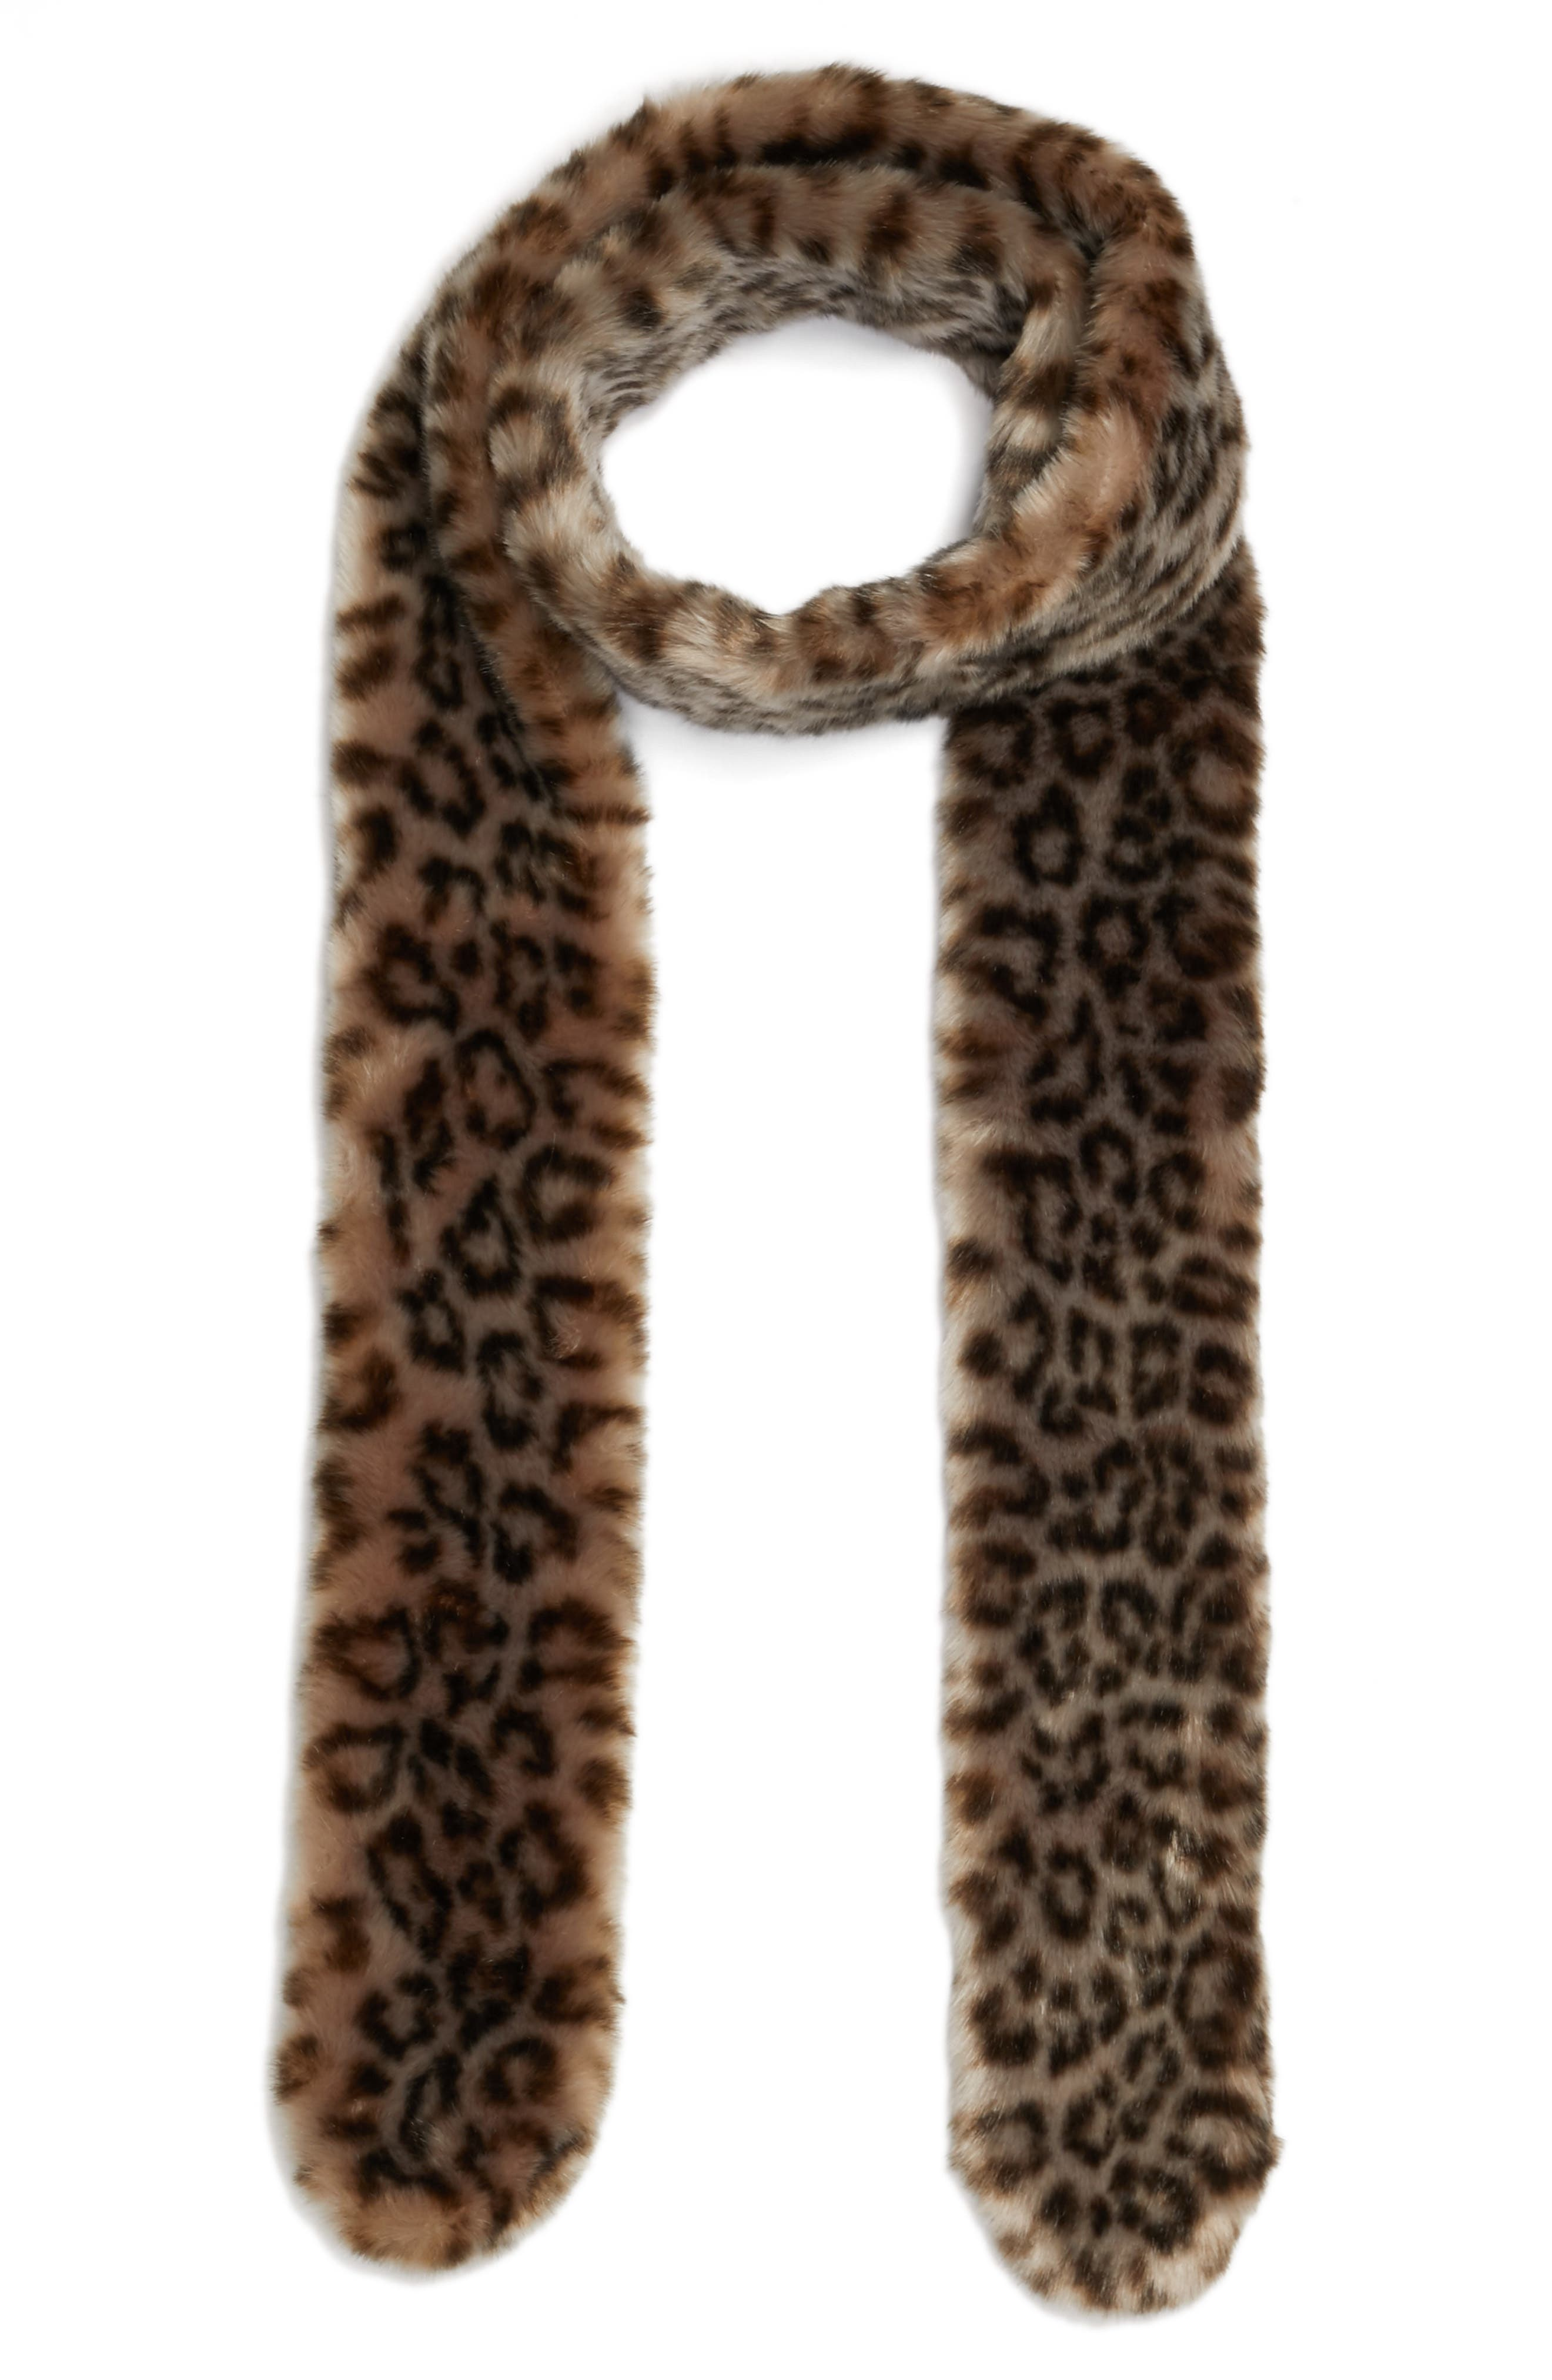 Alternate Image 1 Selected - Shrimps Leopard Print Faux Fur Scarf